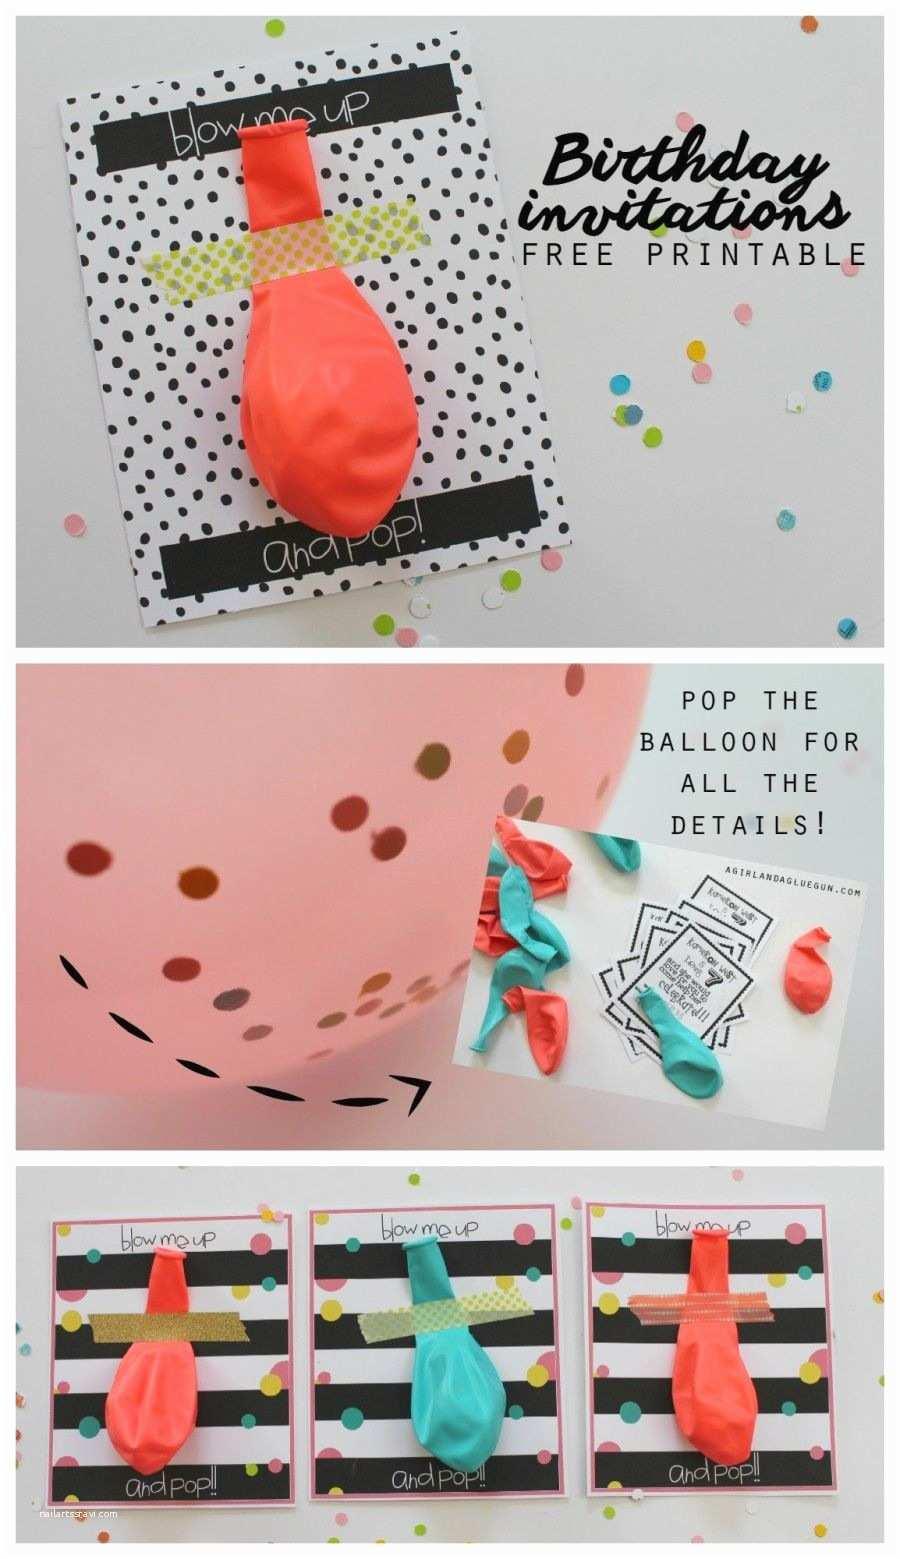 Cool Birthday Invitations Balloon Invitations With Free